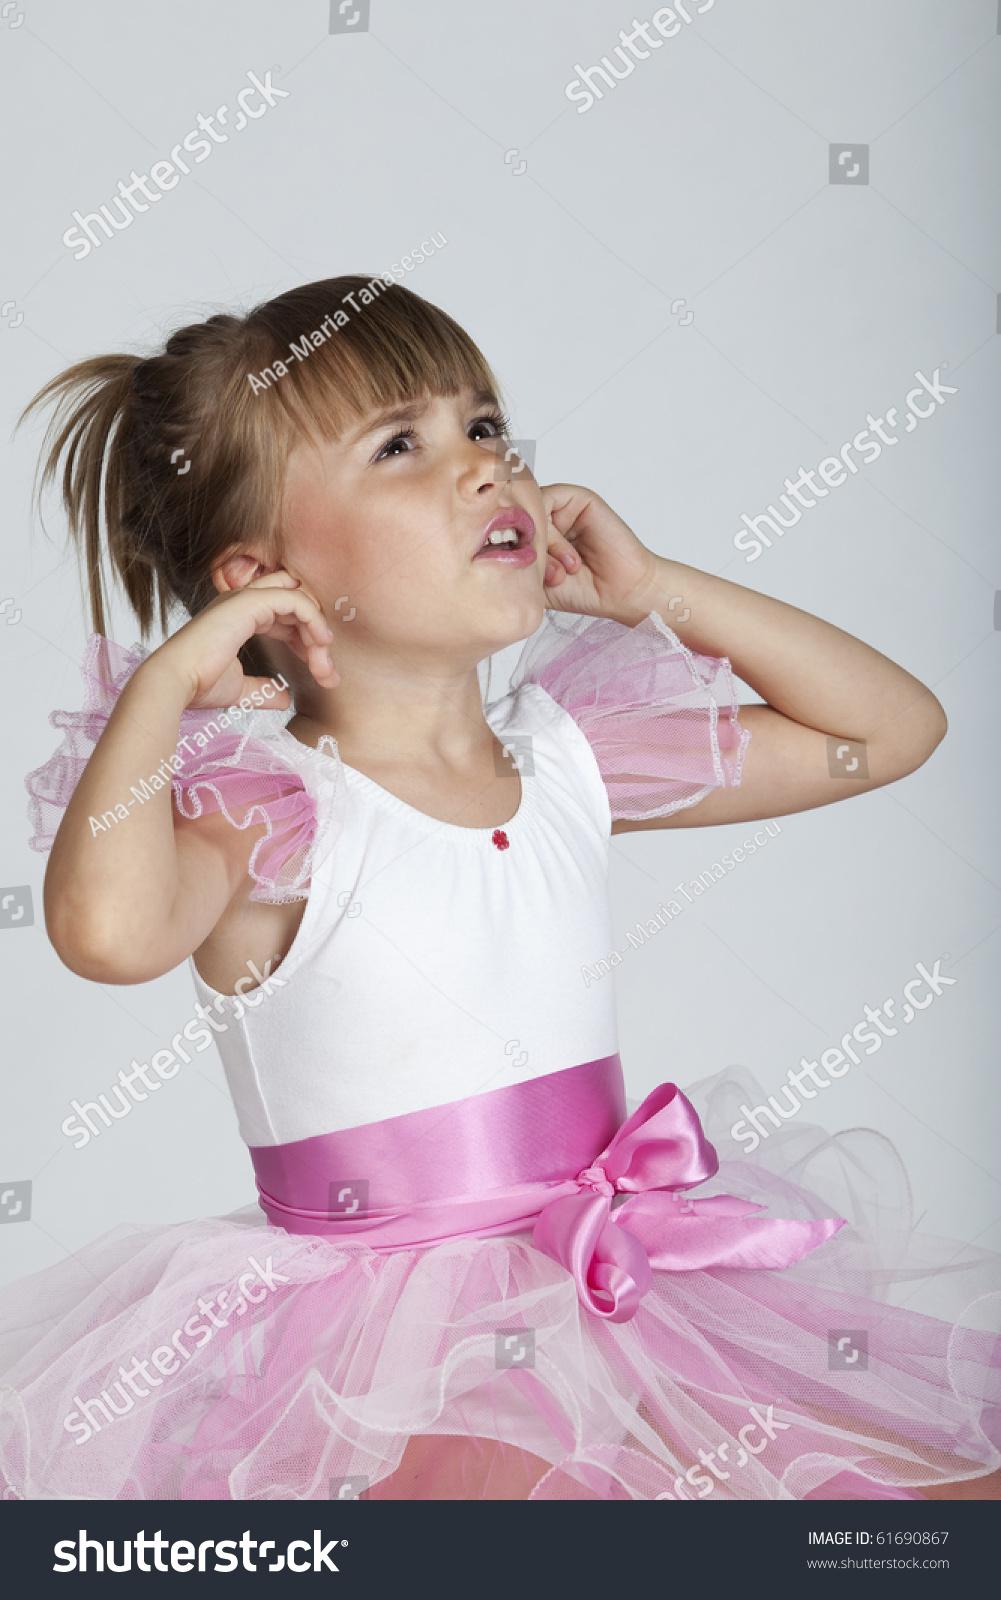 xusenet.com nonude Portrait of a cute little ballerina that is covering her ears,gesturing a  loud noise